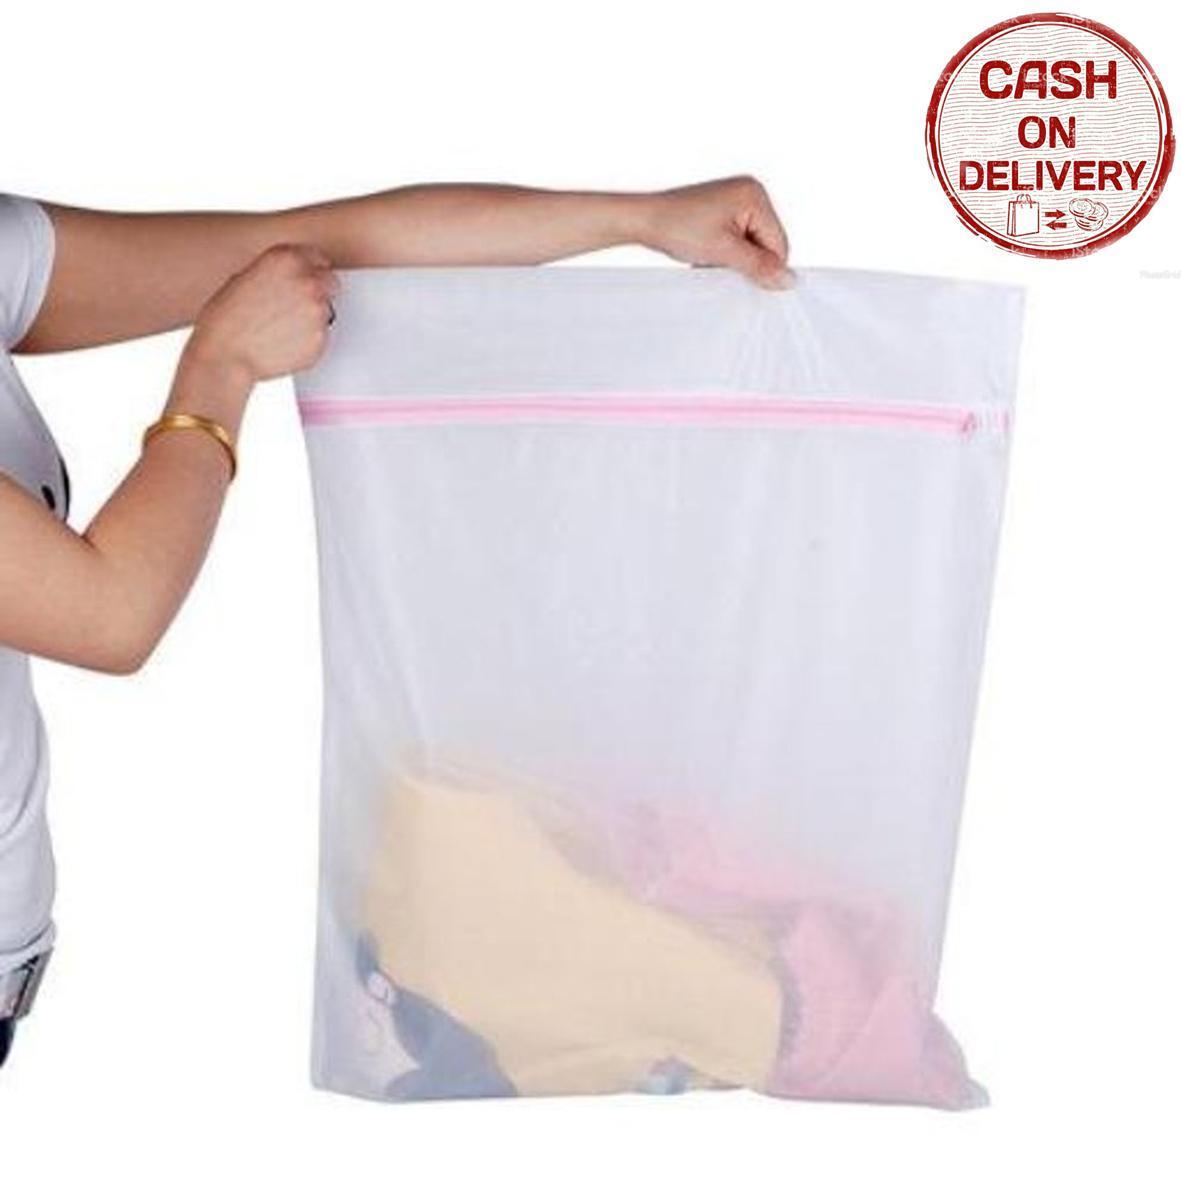 Kado Unik-- Bra Laundry Jaring Resleting Cucian Baju Kotor / Kantong Resleting / Tas Laundry / Tas Jaring / Tempat Baju Kotor / Kantong Tempat Pemisah Pakaian Kotor / Tas Laundry Jaring Transparan / Kantong Resleting Murah / Jaring Mesin Cuci